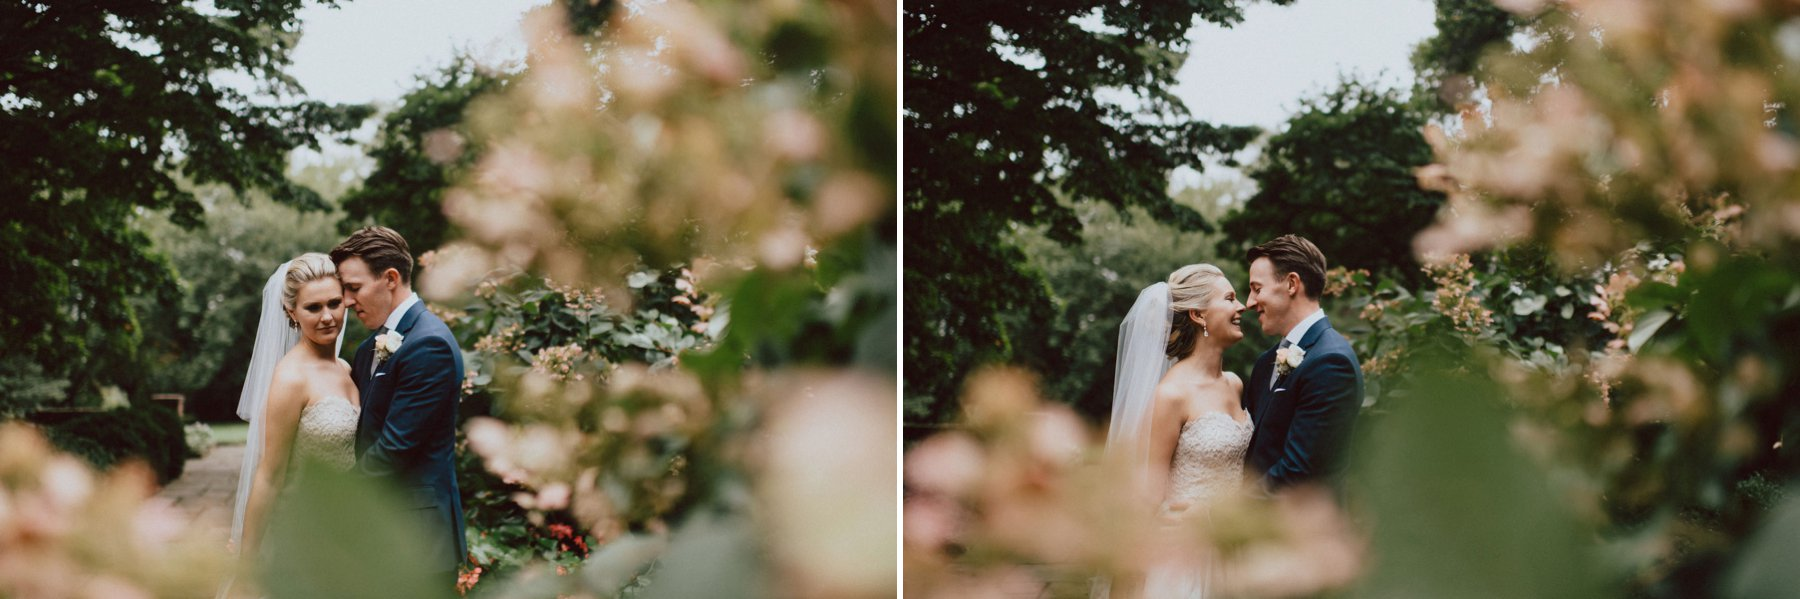 greenville-country-club-wedding-74.jpg